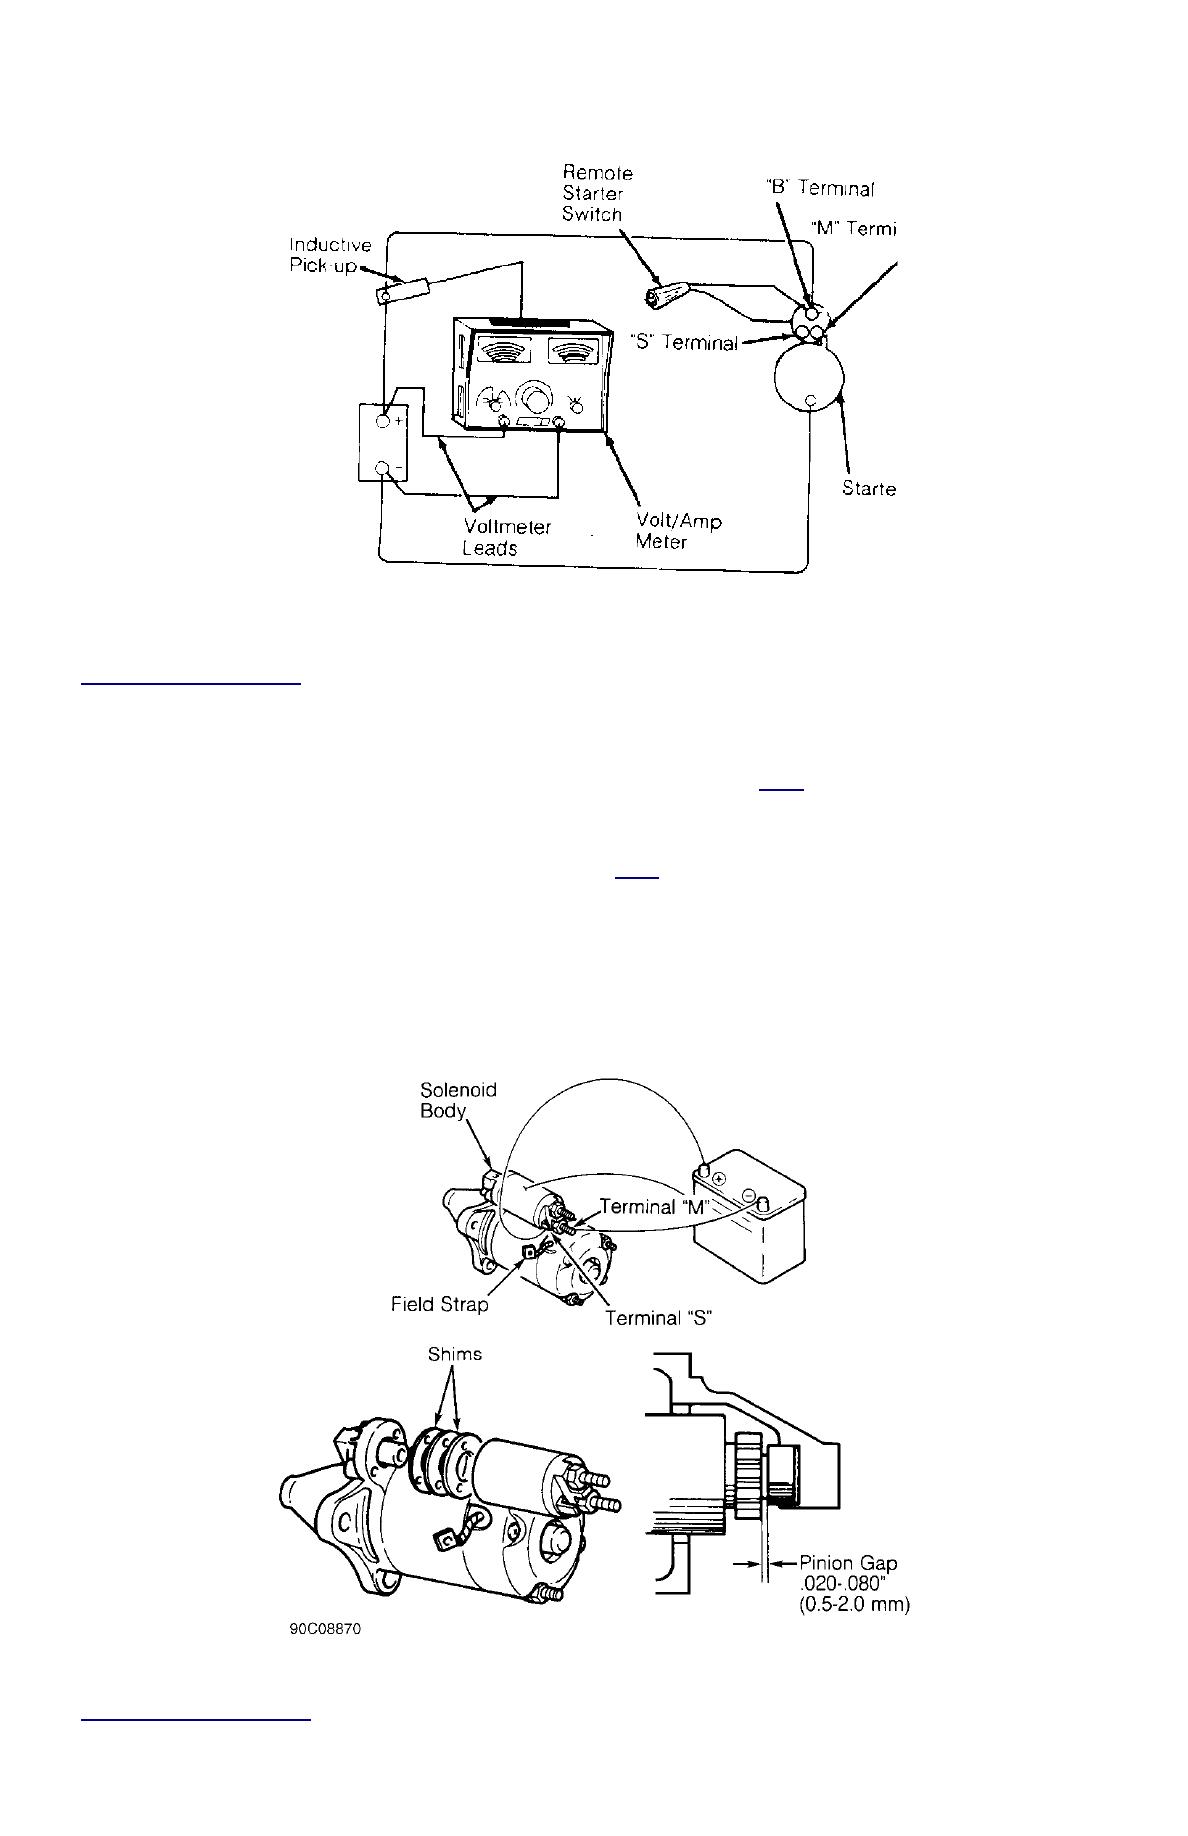 Ford Festiva Instruction Part 14 Opel Remote Starter Diagram 4 No Load Test